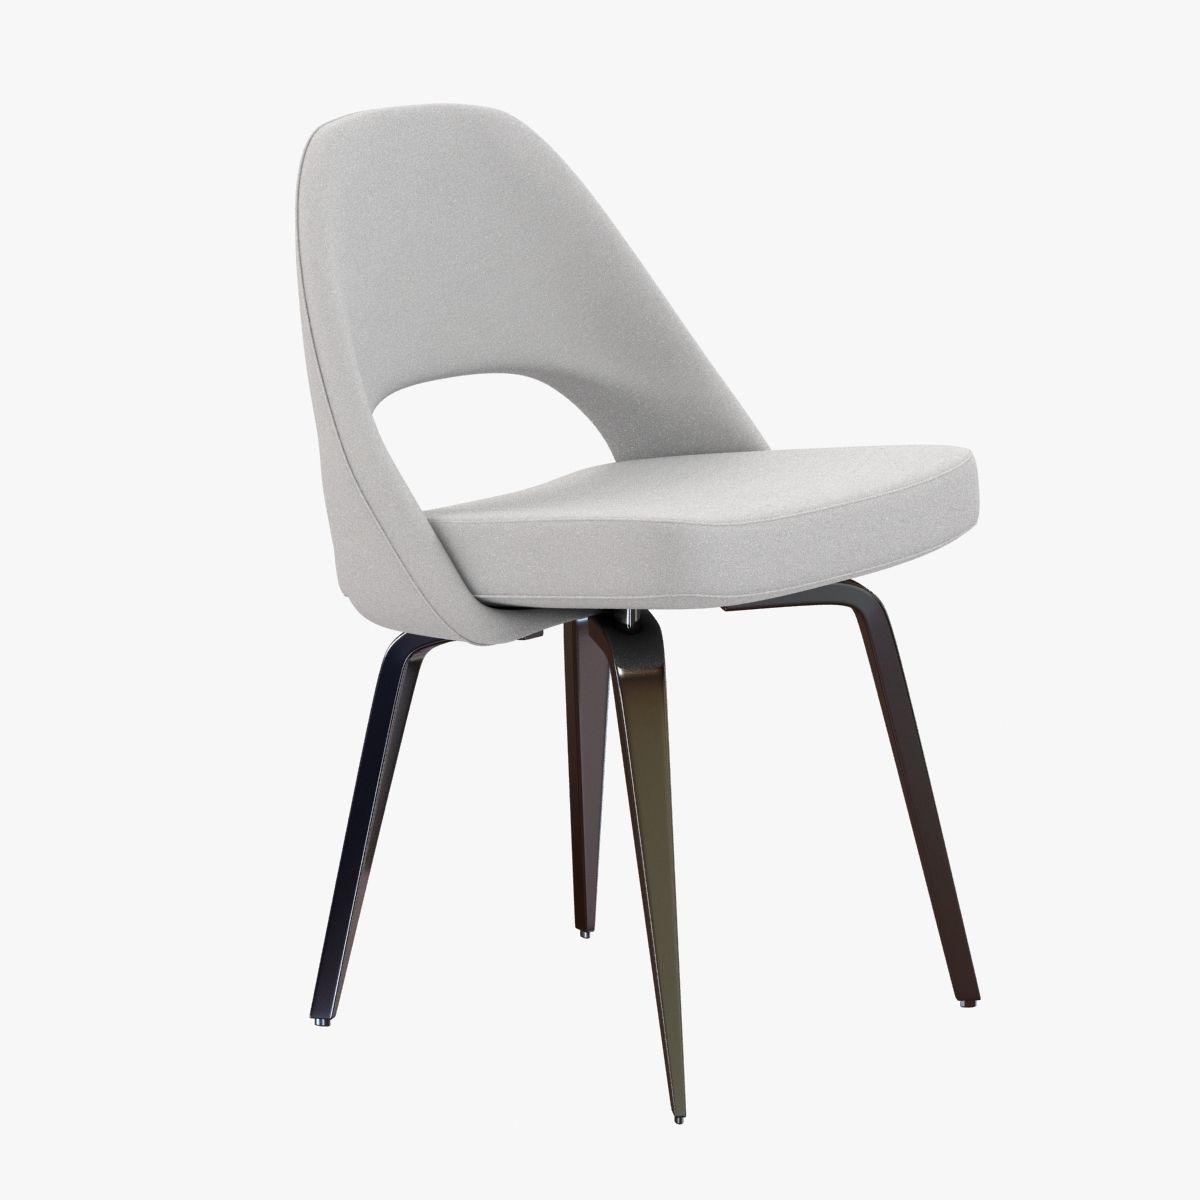 3d model saarinen executive side chair cgtrader